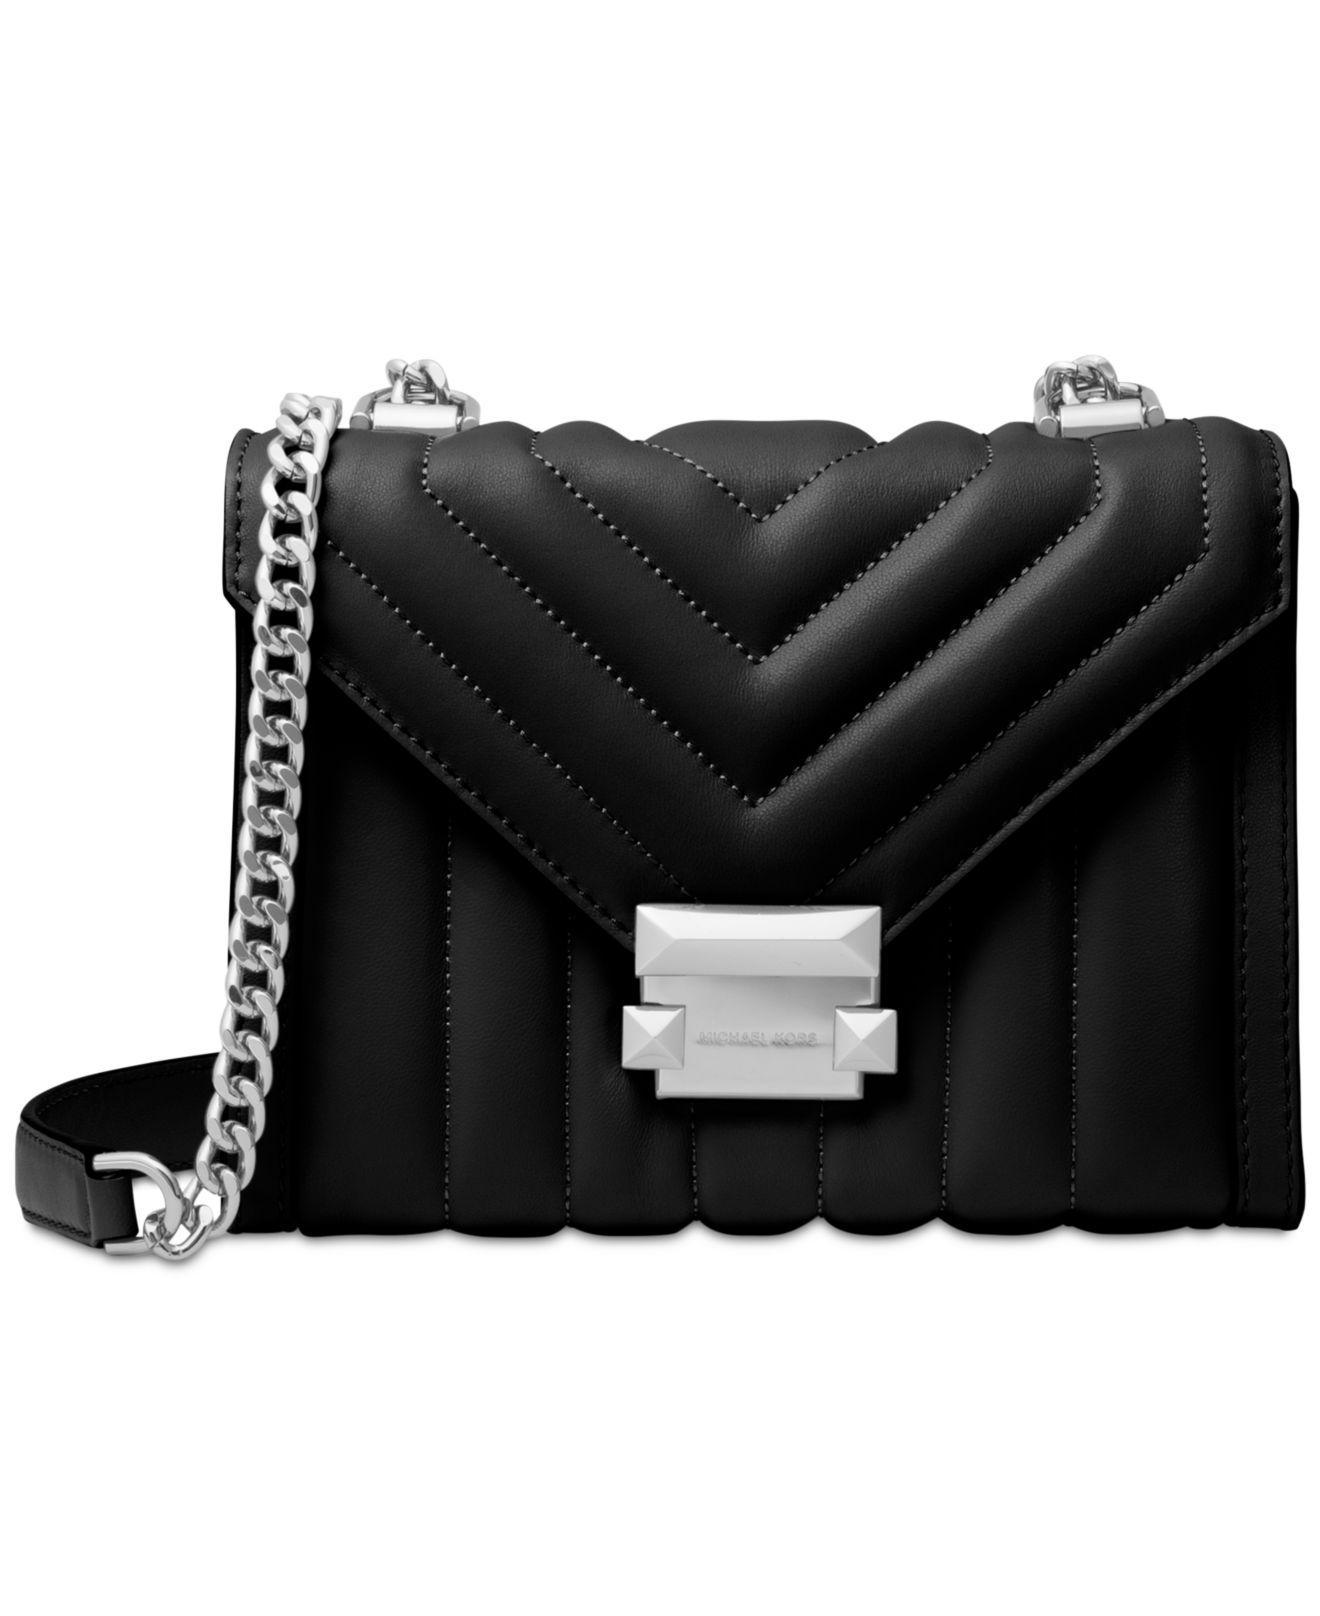 1bd909805432 Michael Kors. Women s Black Michael Whitney Mini Quilted Leather Shoulder  Bag